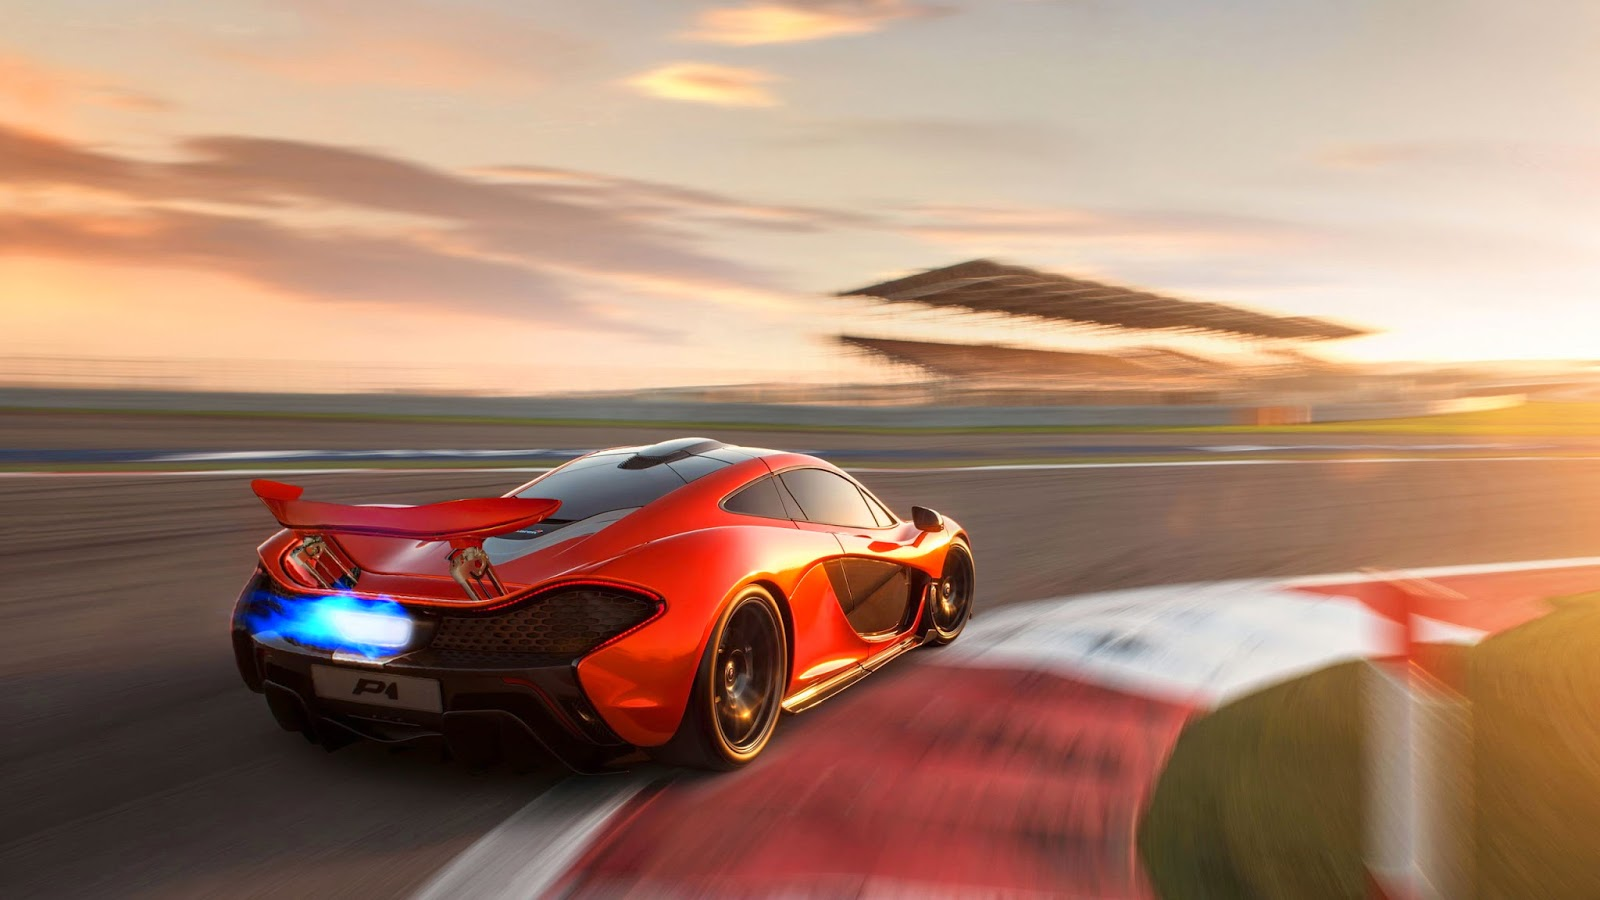 Sport Cars Wallpaper For Iphone 7: Allinallwalls : Car Wallpapers 2014, Iphone Car, Fast Cool